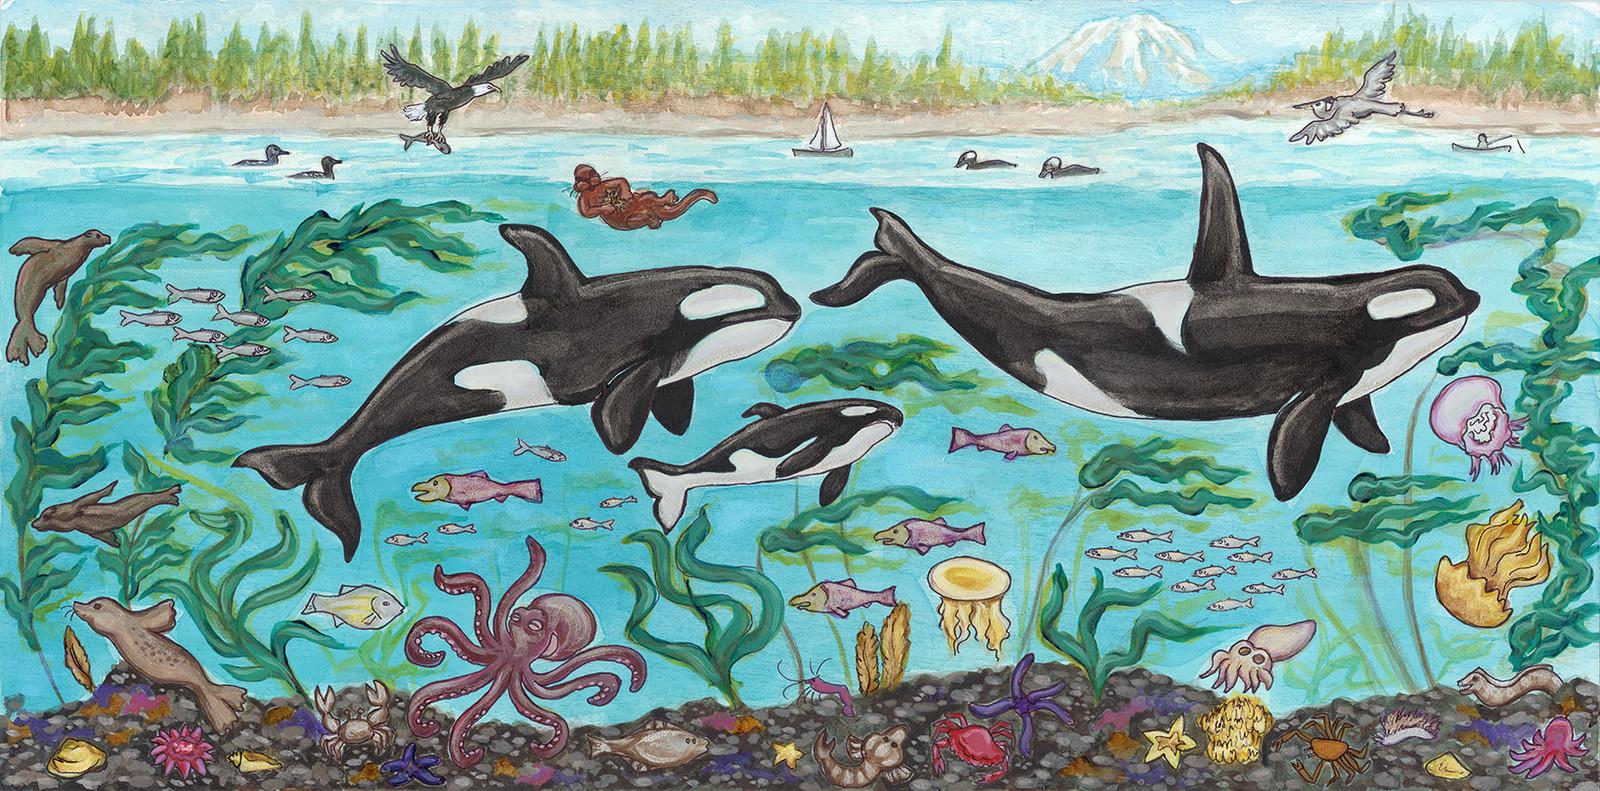 Orcas under Puget Sound